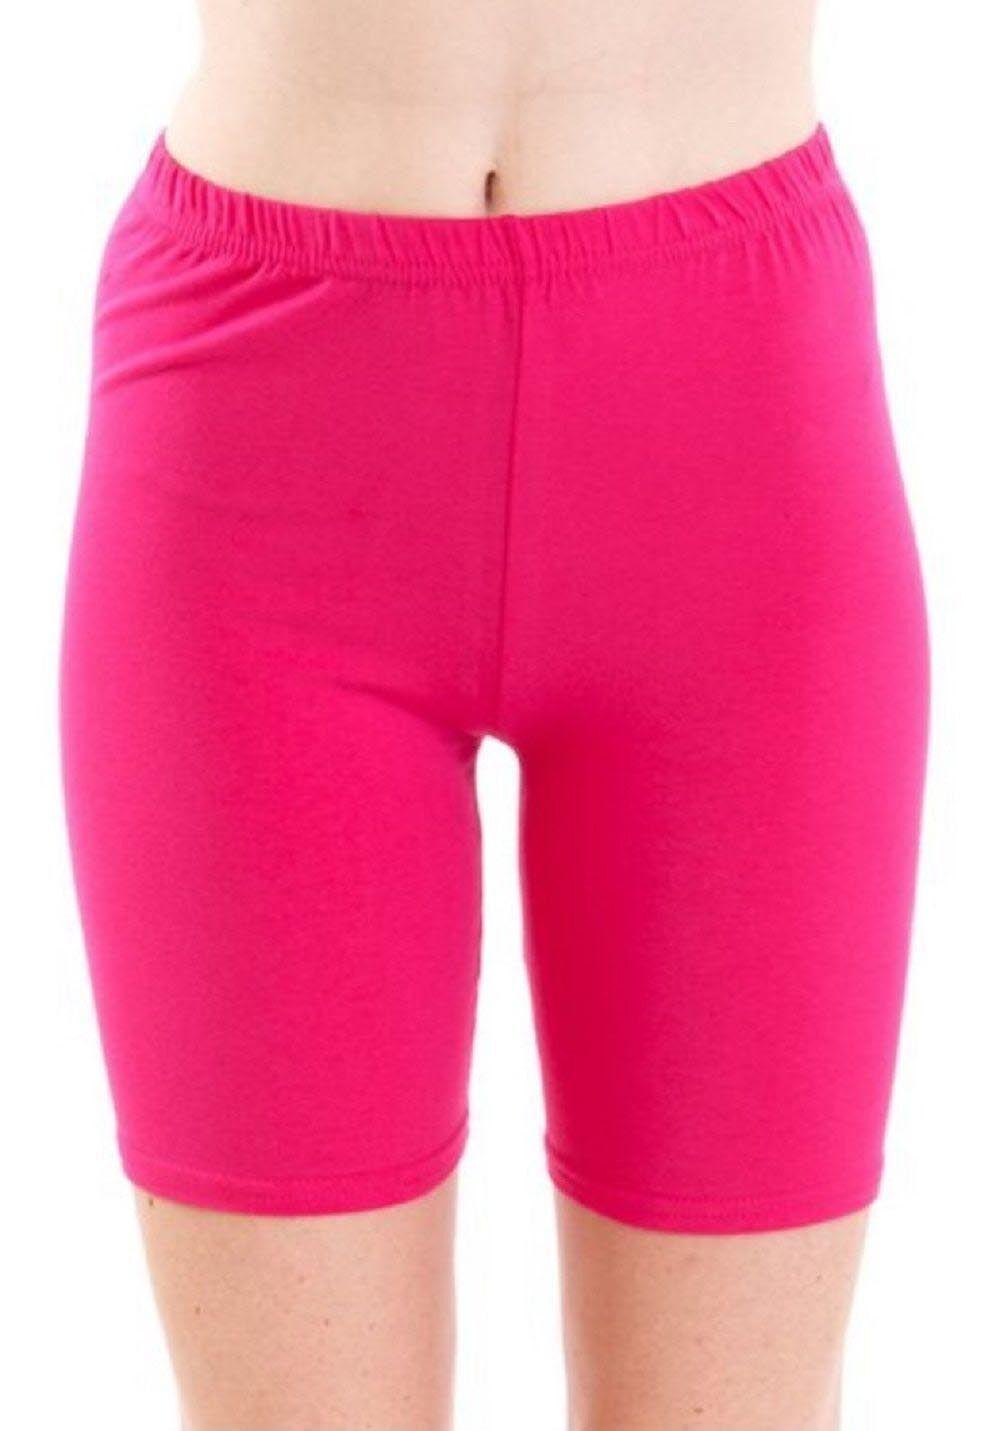 Hot spandex shorts — 6